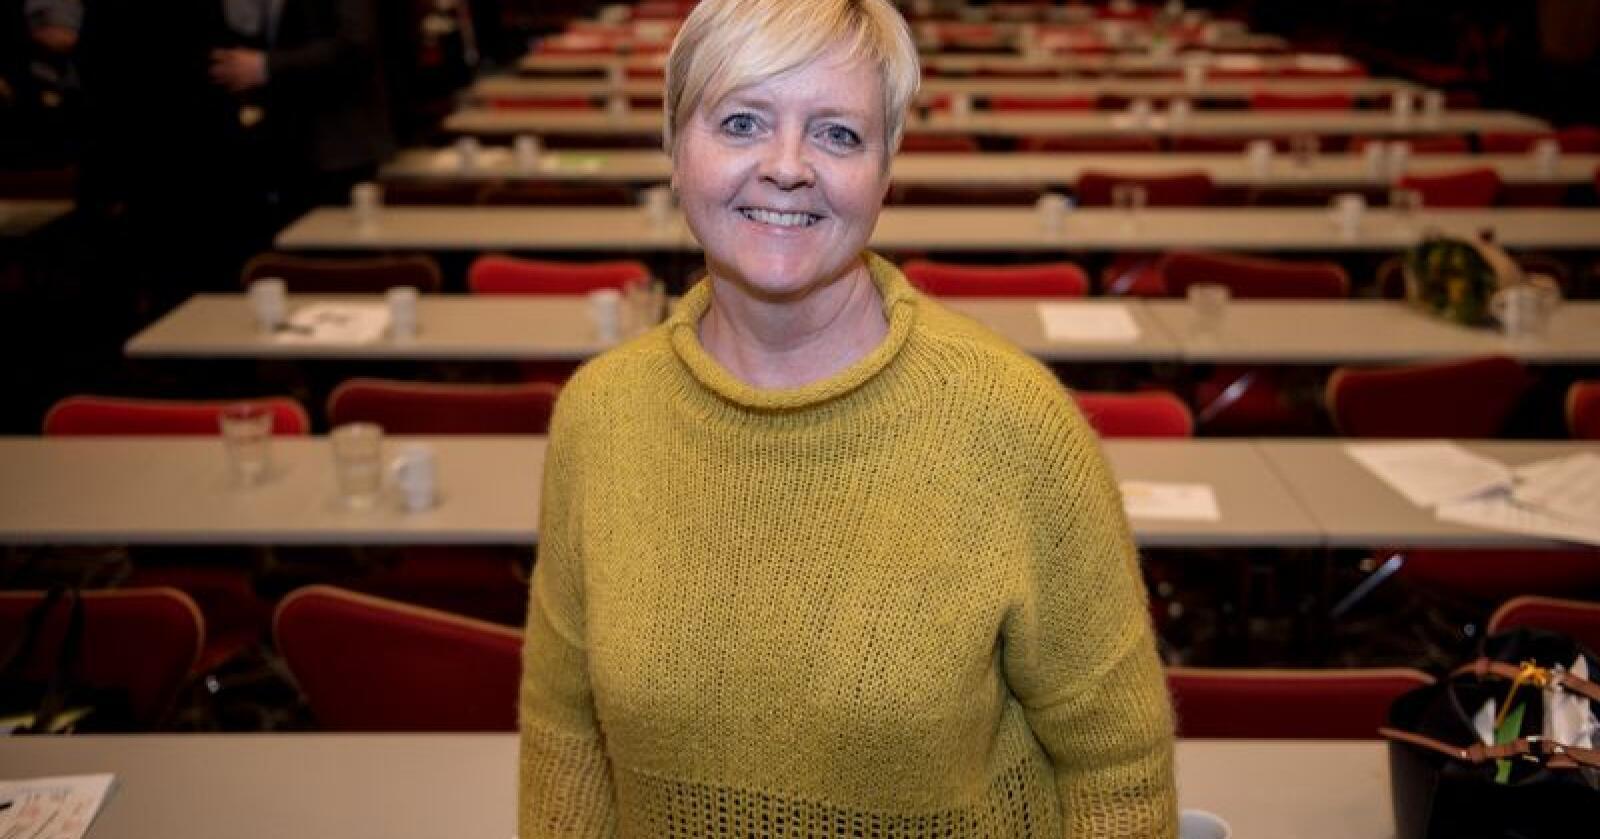 Fylkesordførar Solveig Ege Tengesdal. Foto: Carina Johansen / NTB Scanpix